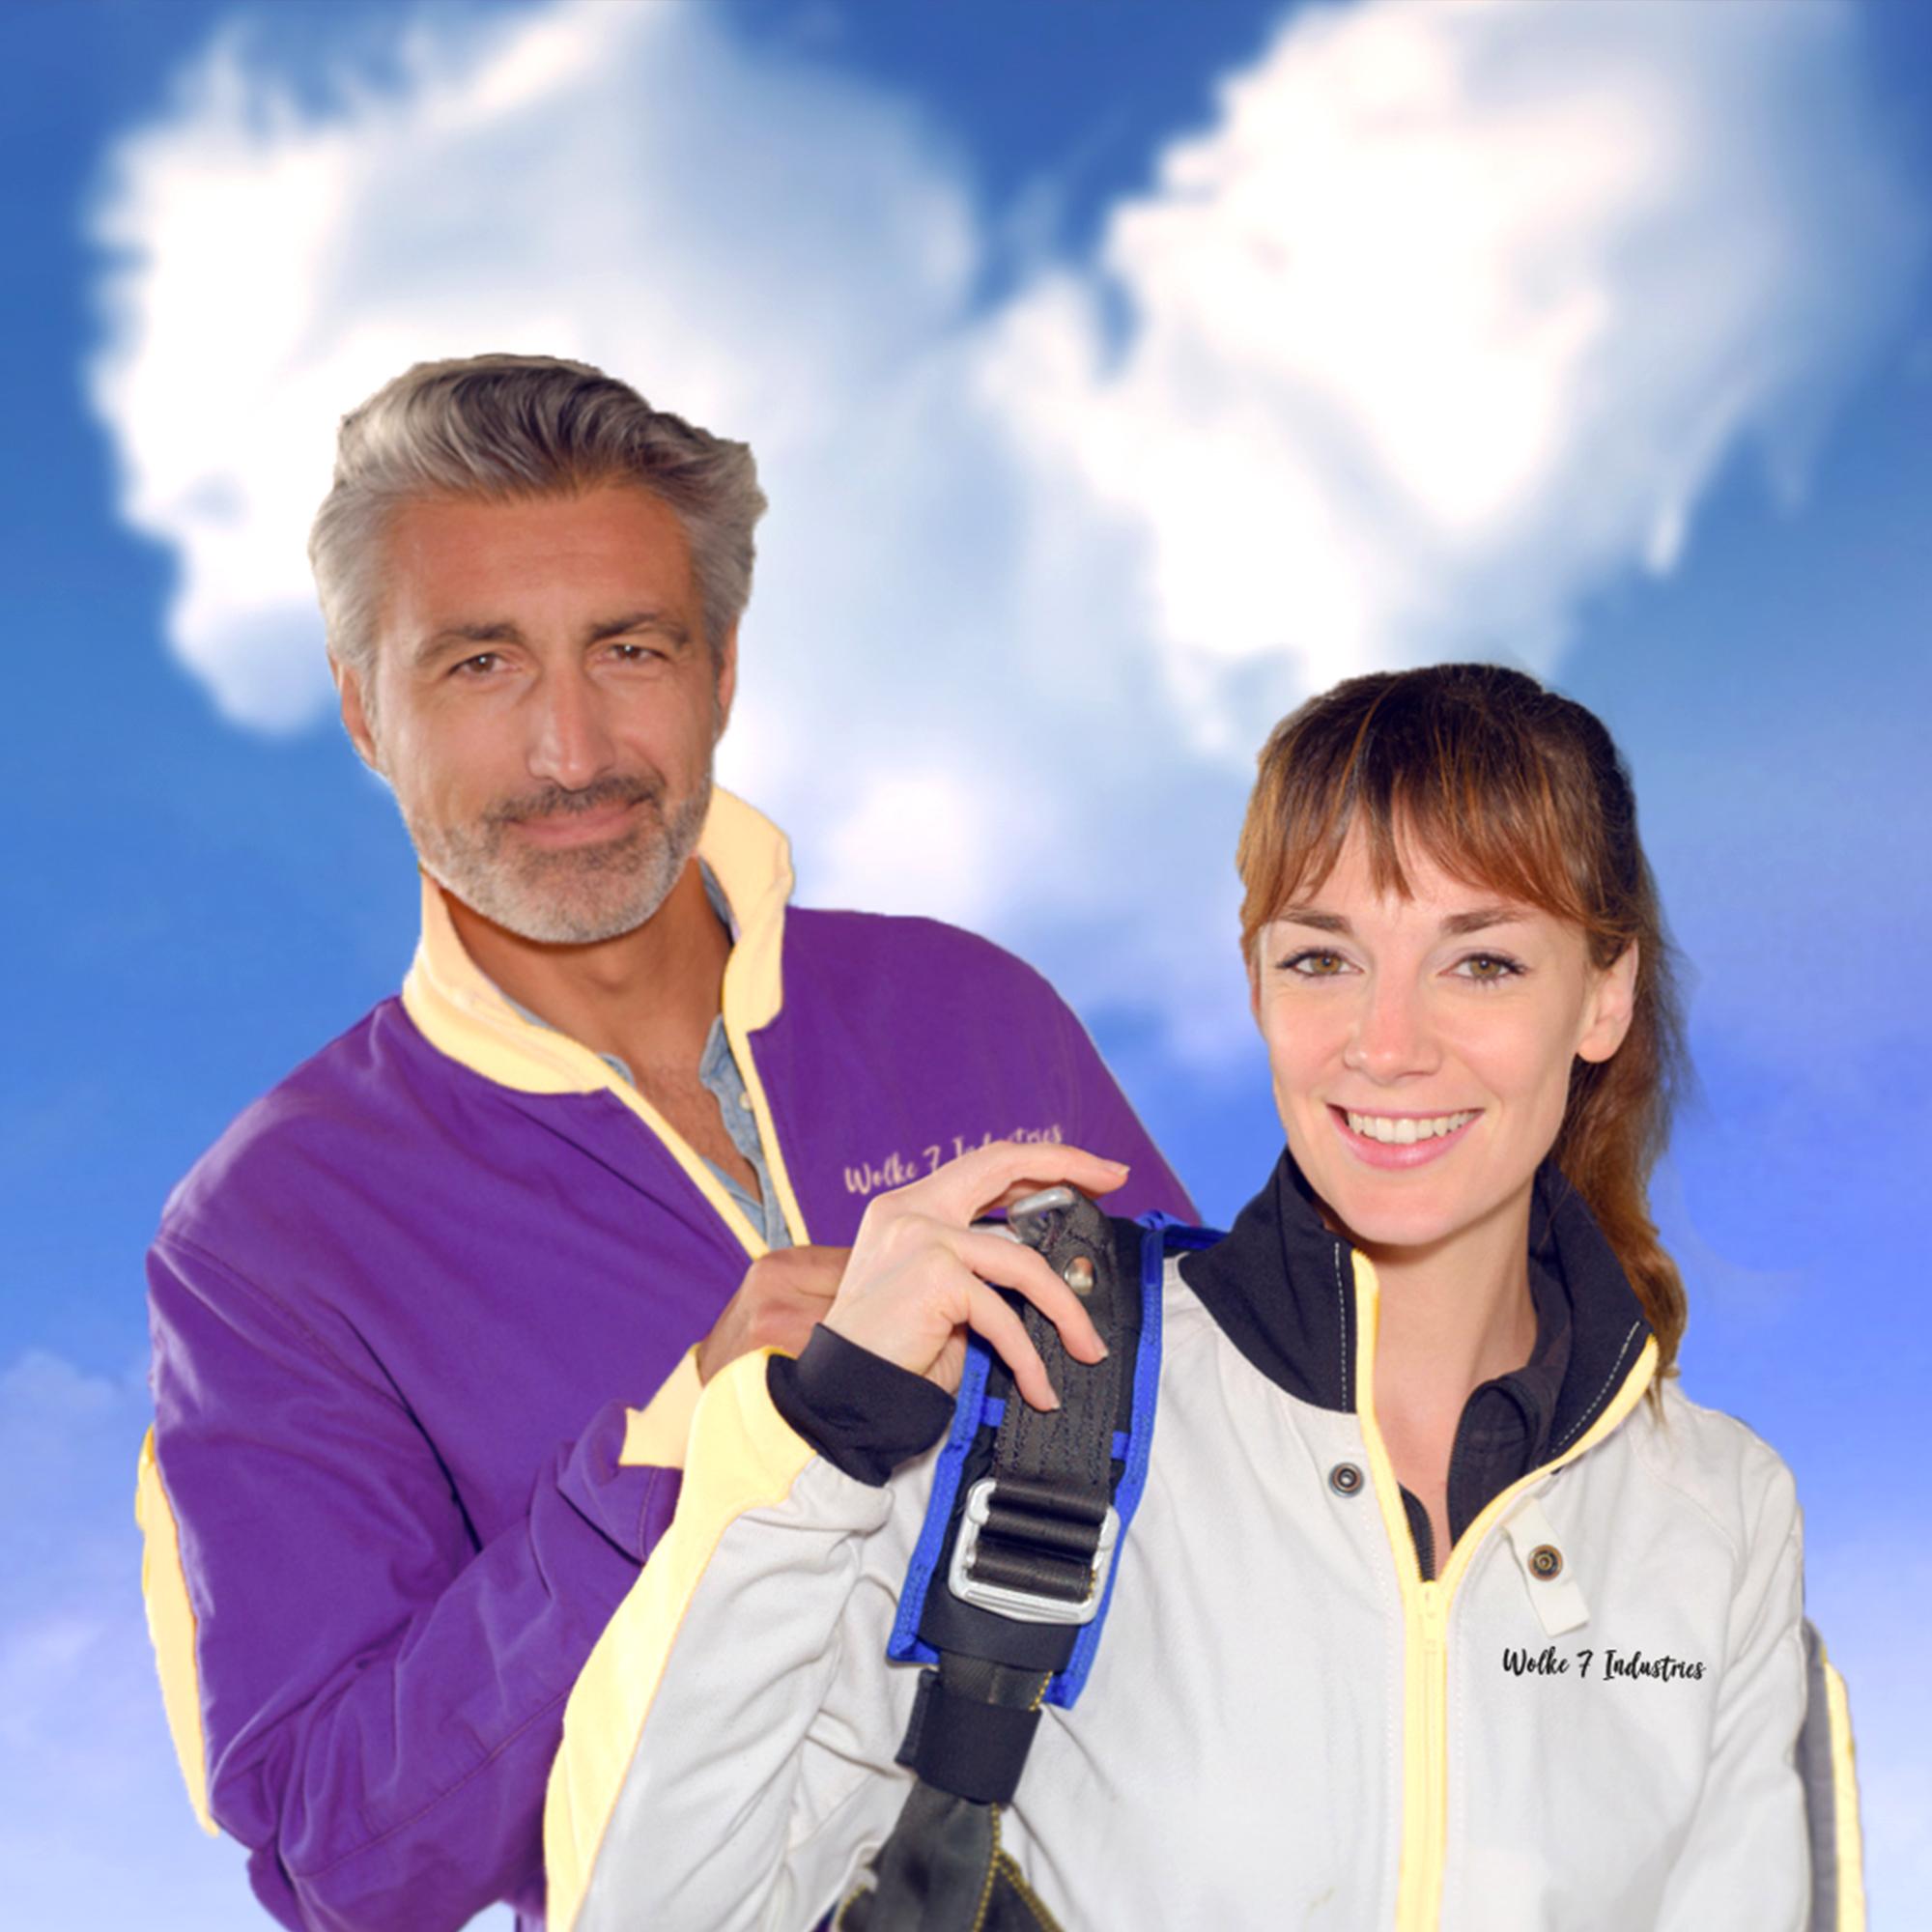 Romantischer Fallschirmsprung durch Wolke 7 - 3